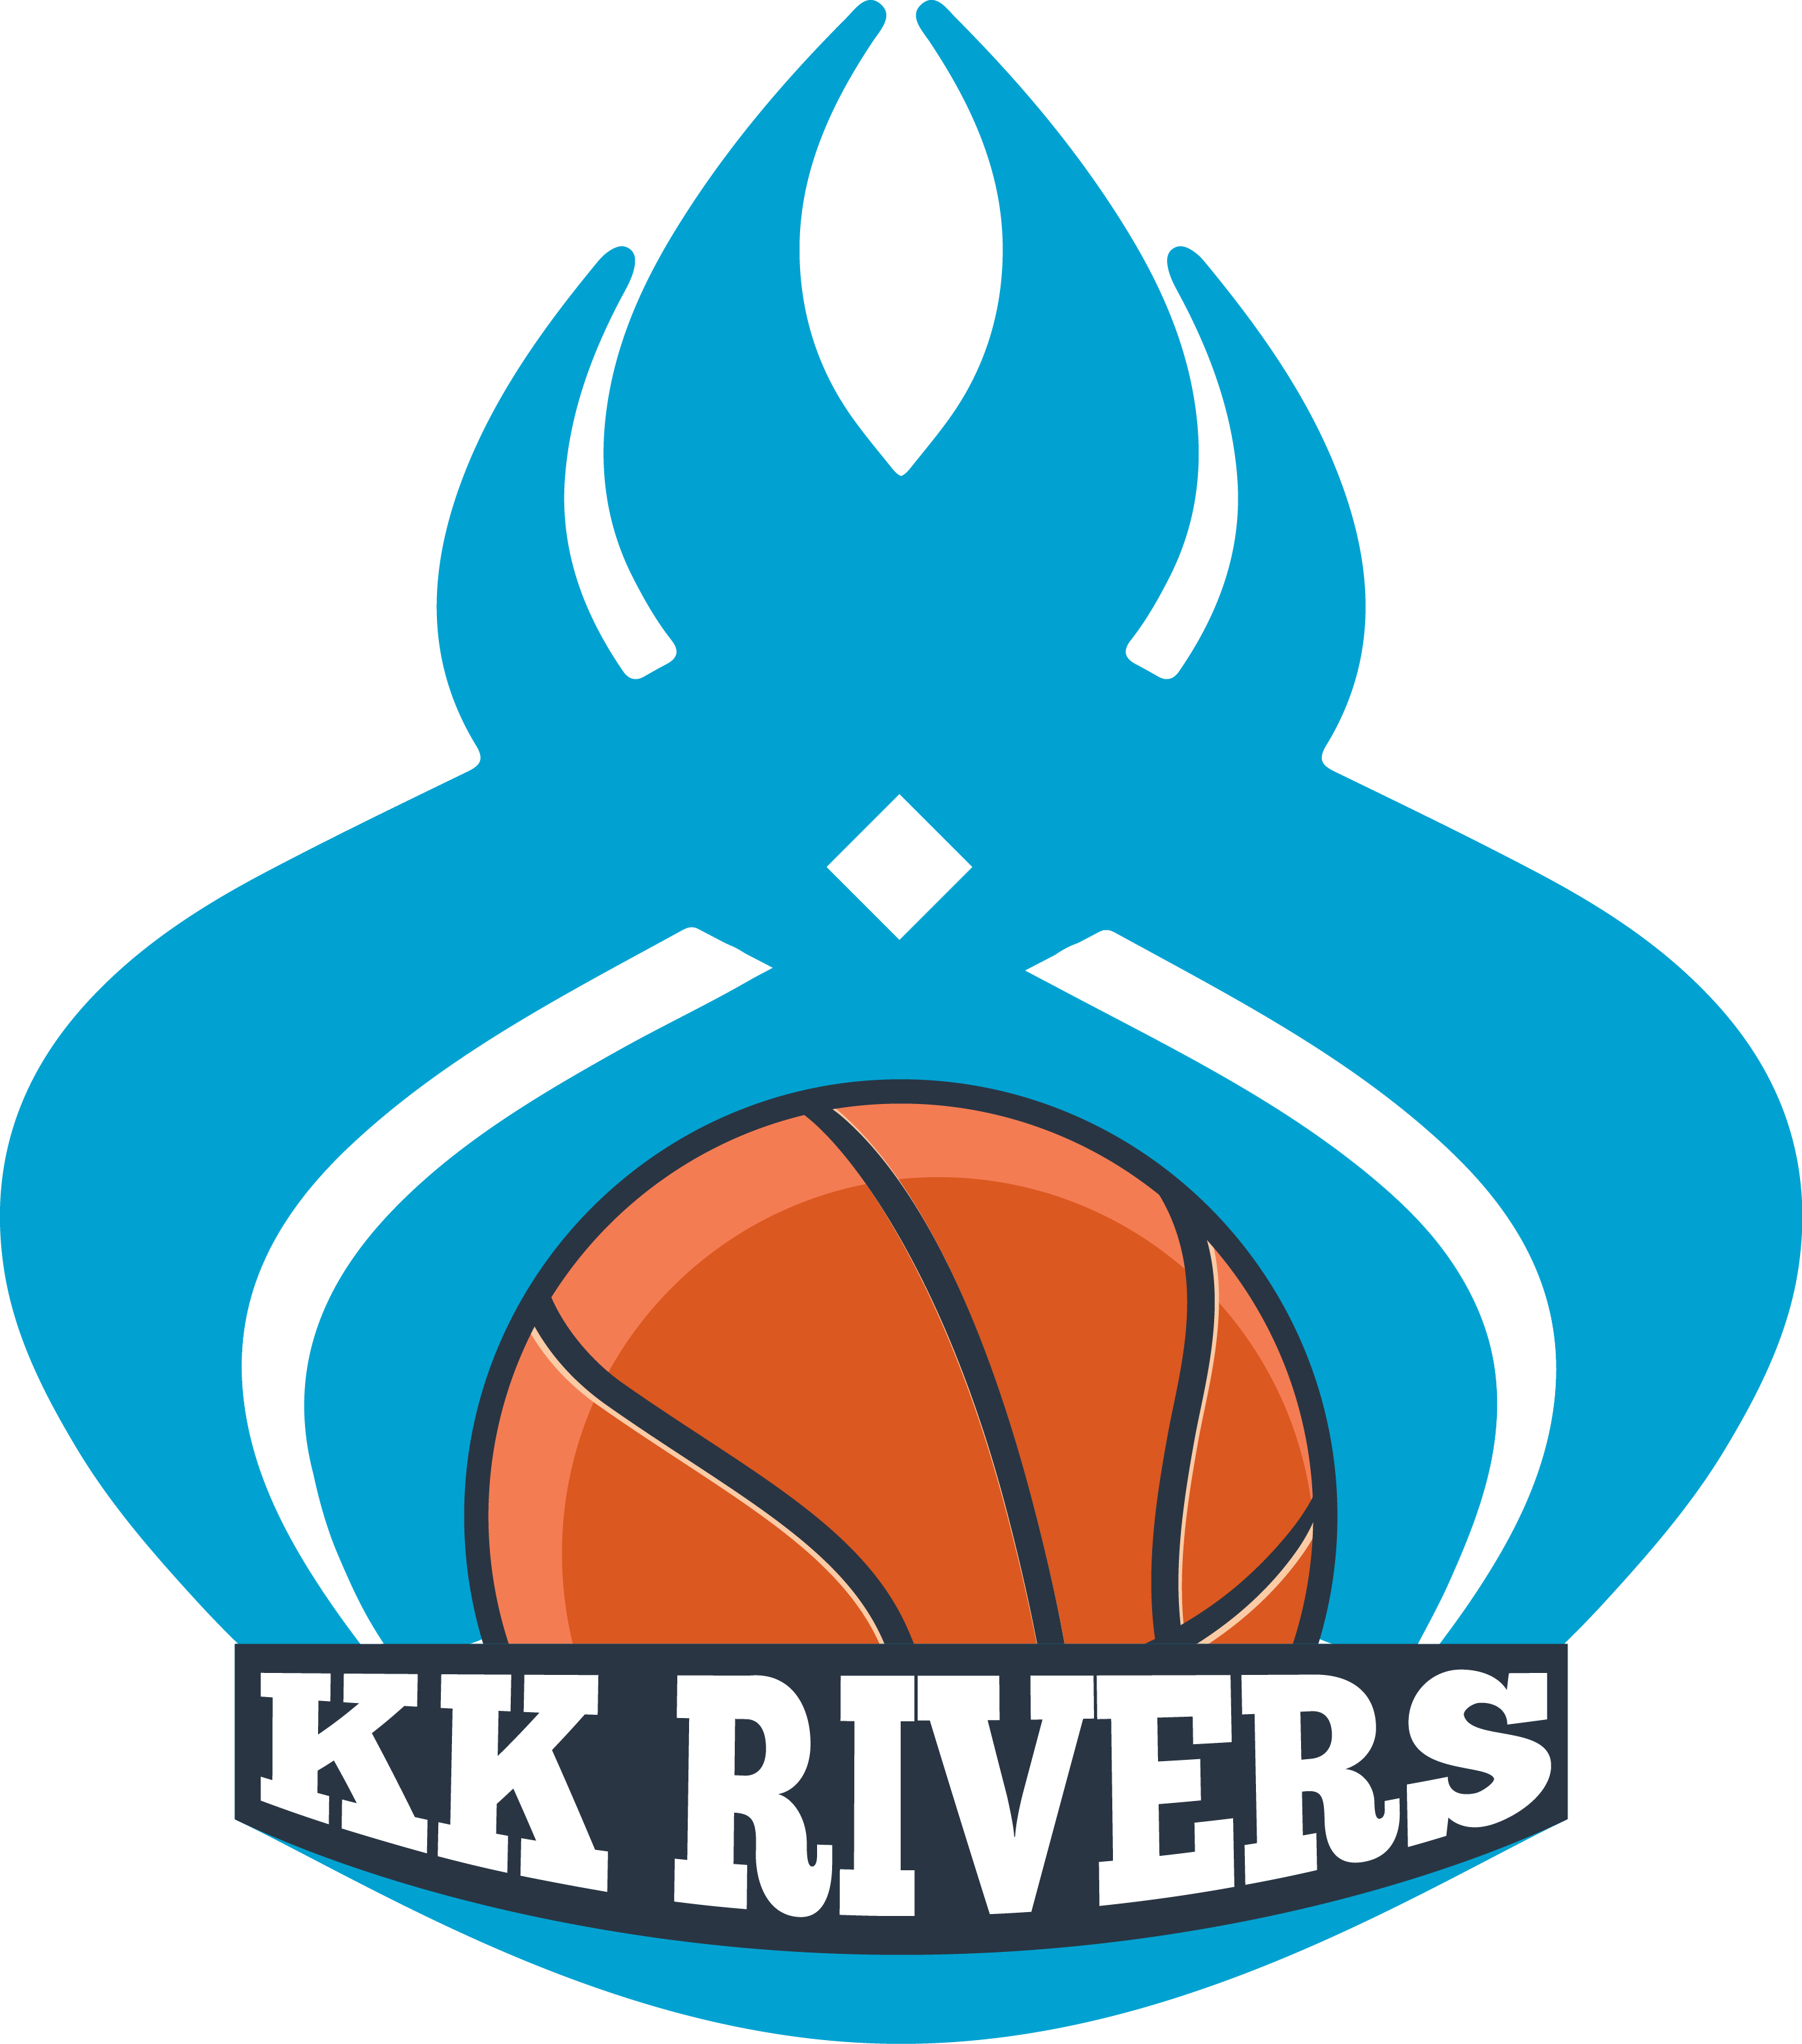 KK Rivers BM Beograd